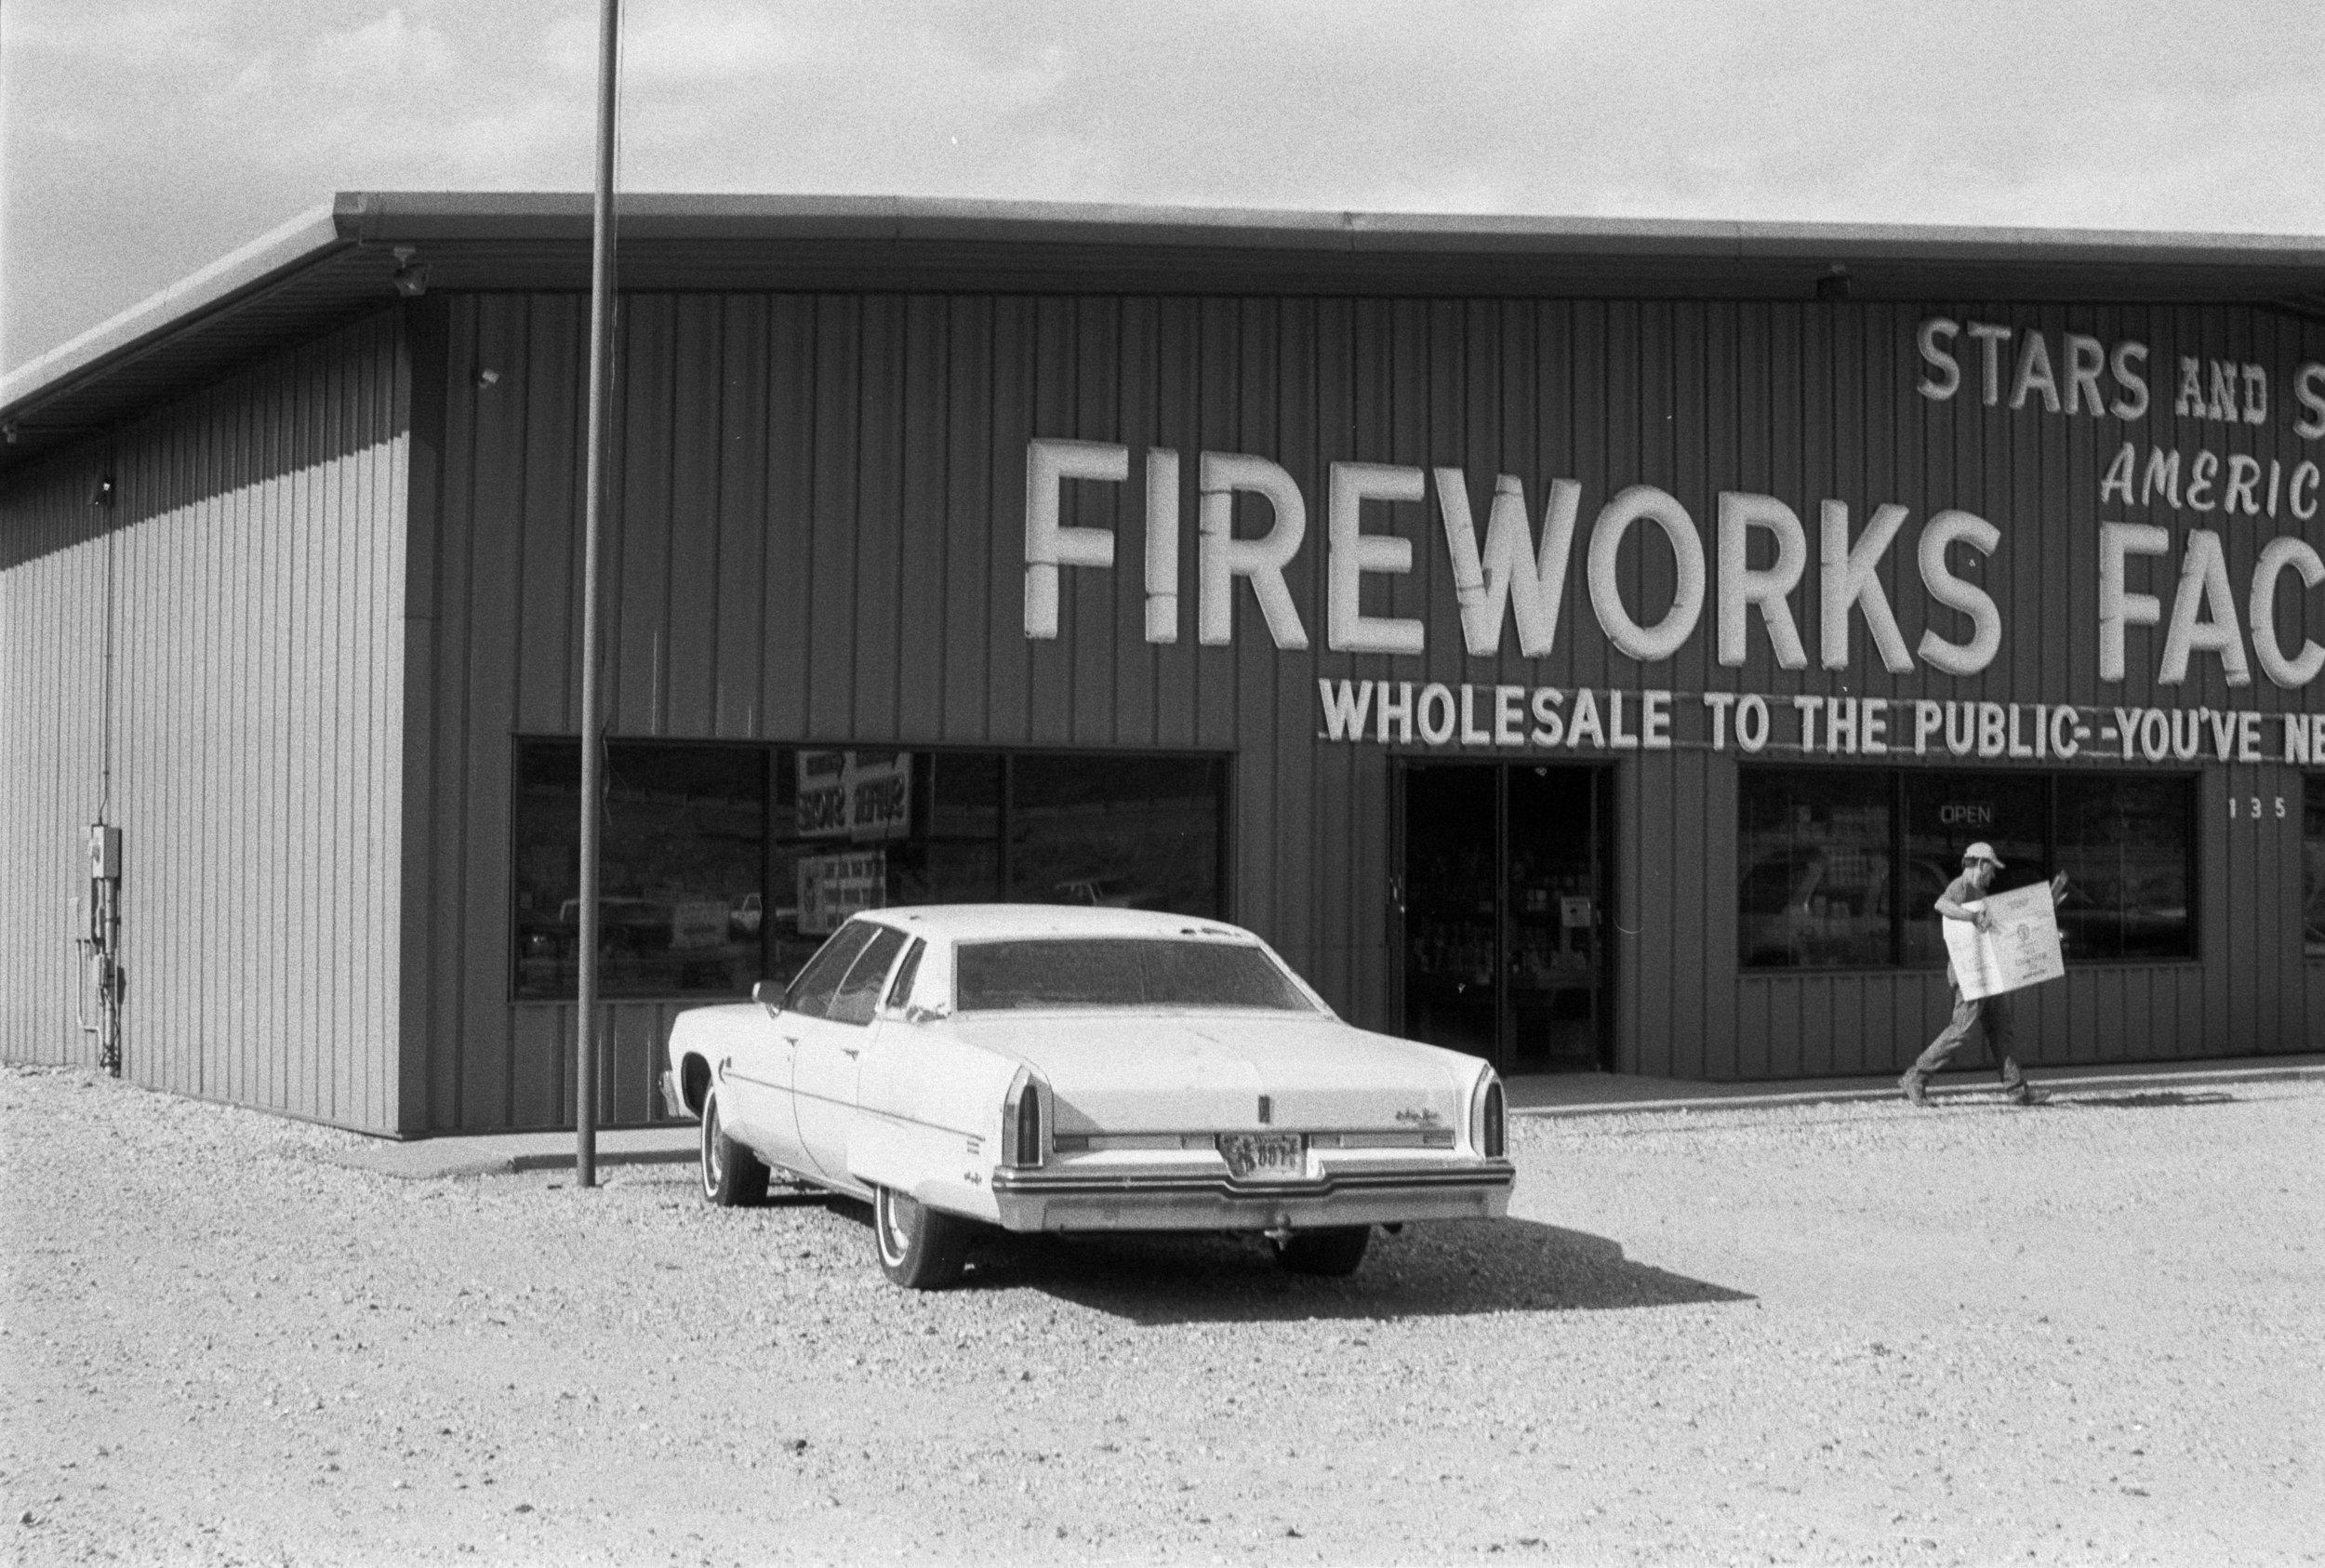 Fireworks | Cody, Wyoming 2015